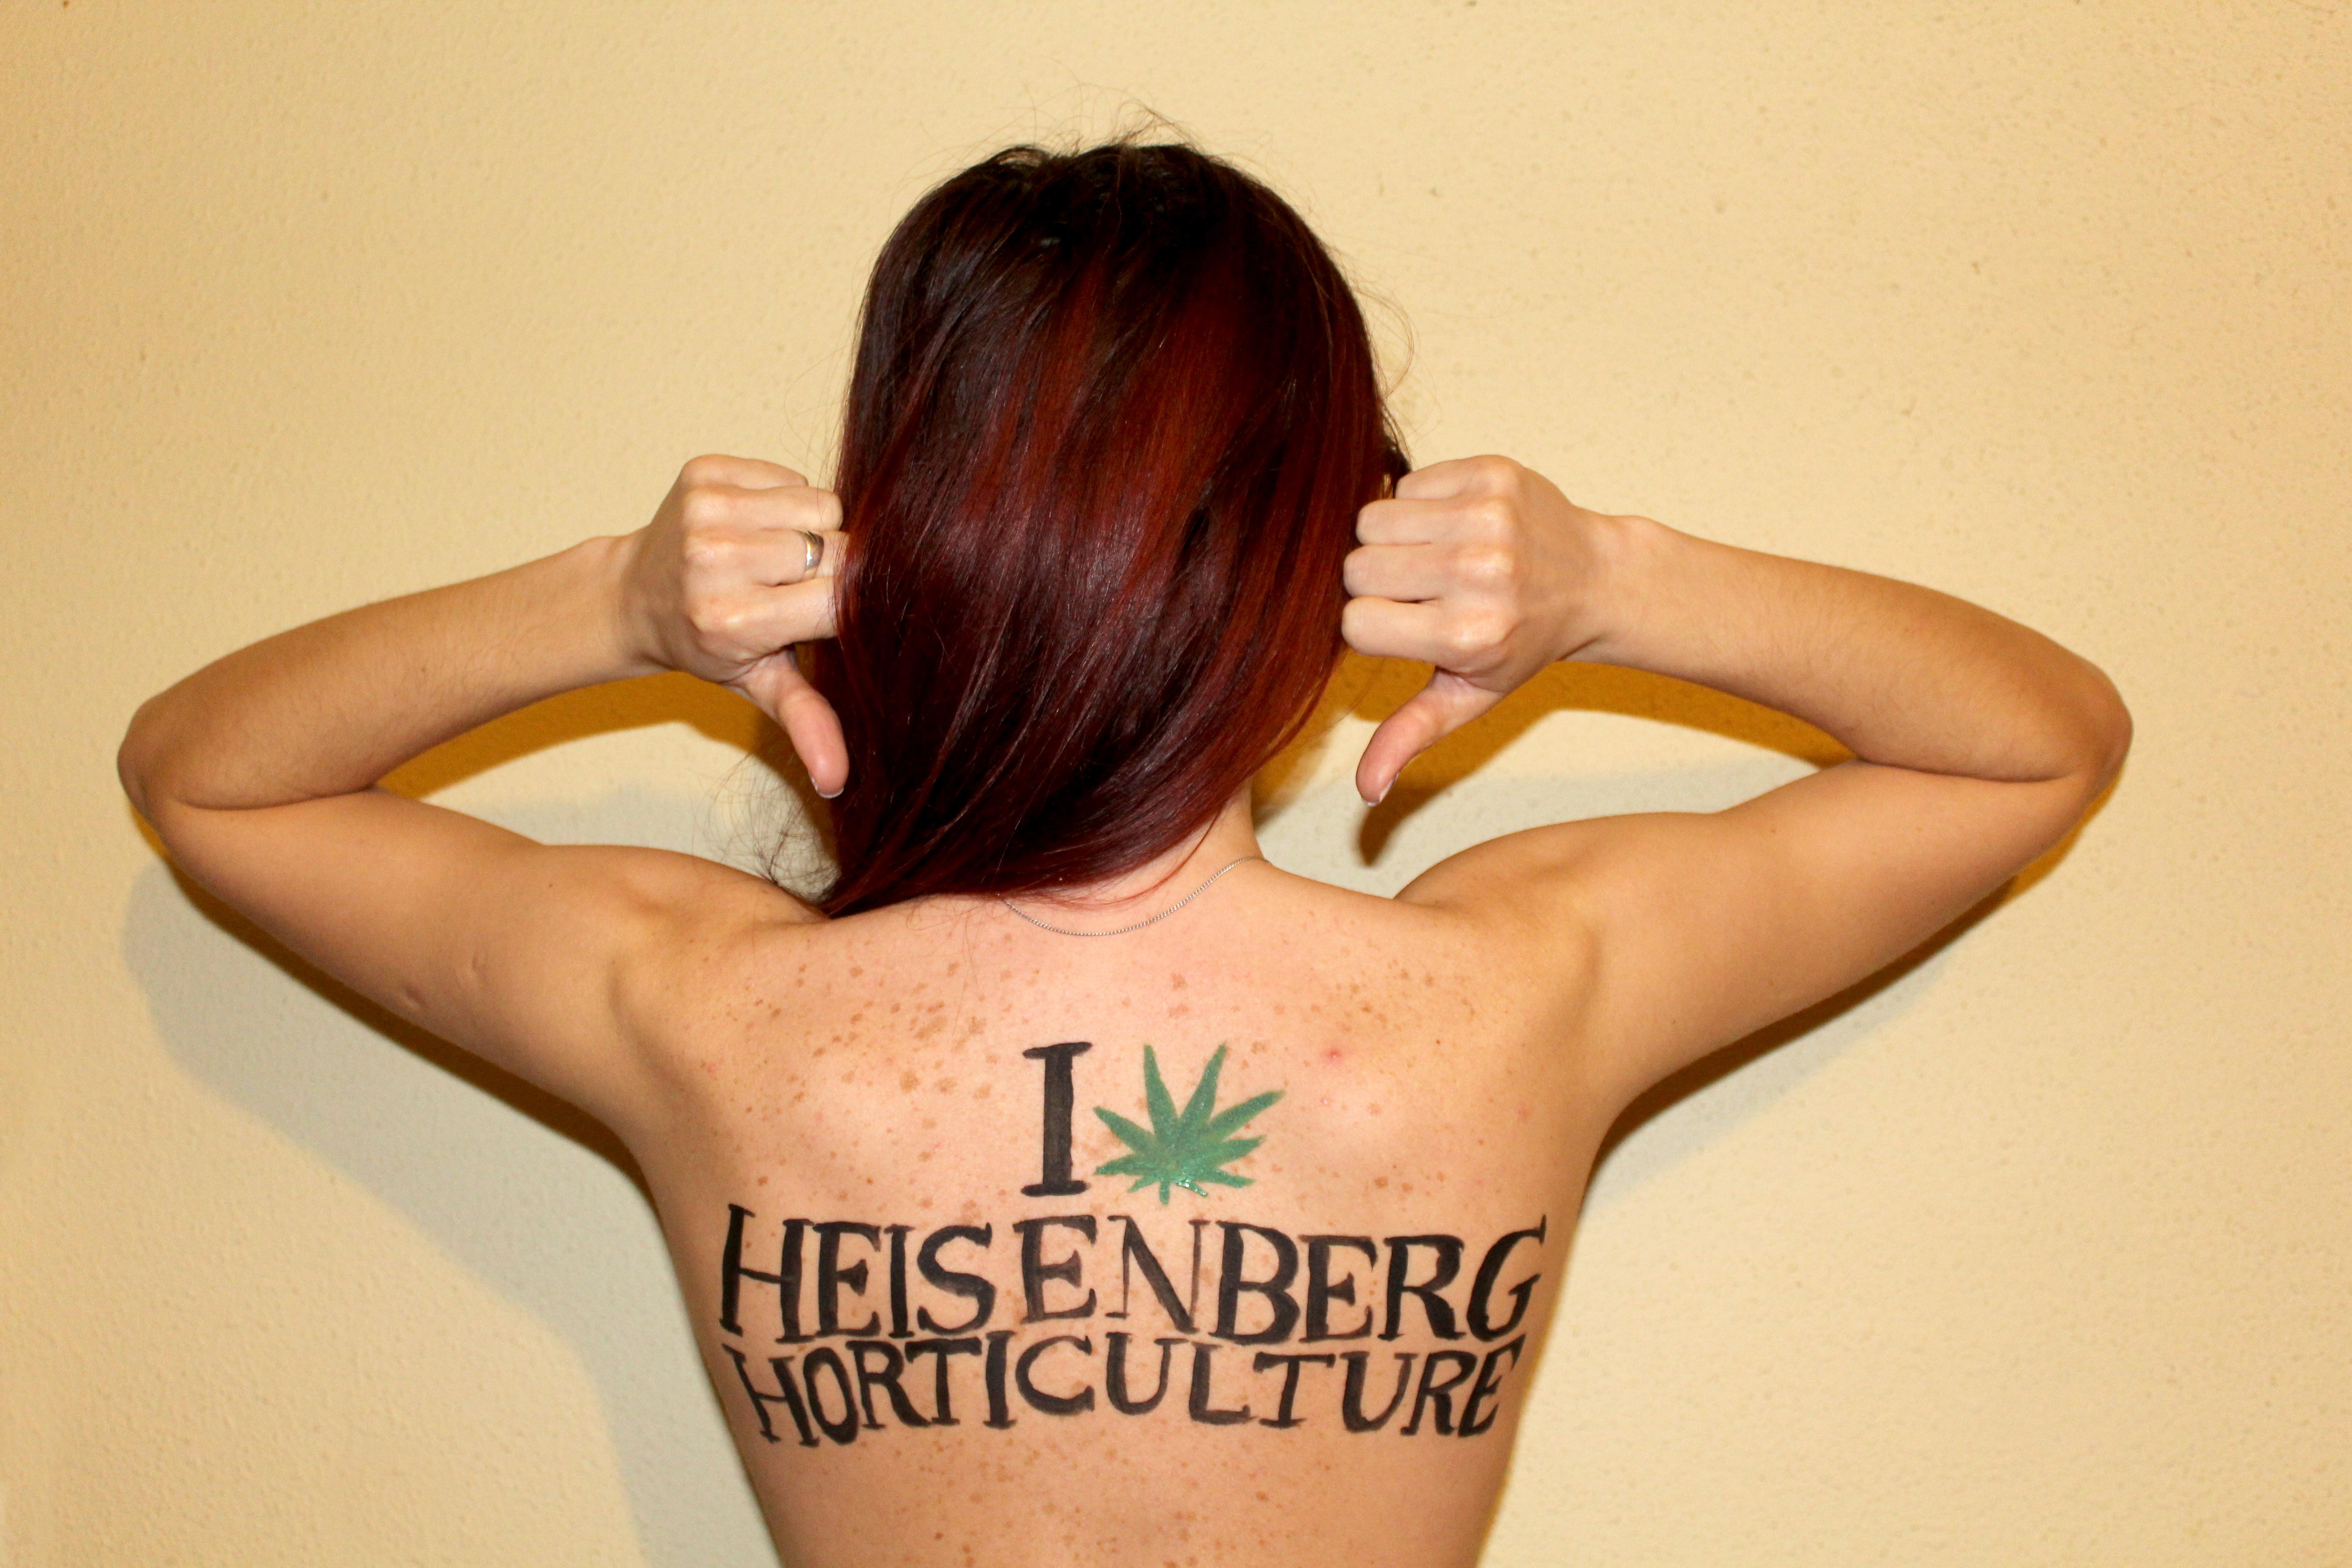 Heisenberg Horticulture